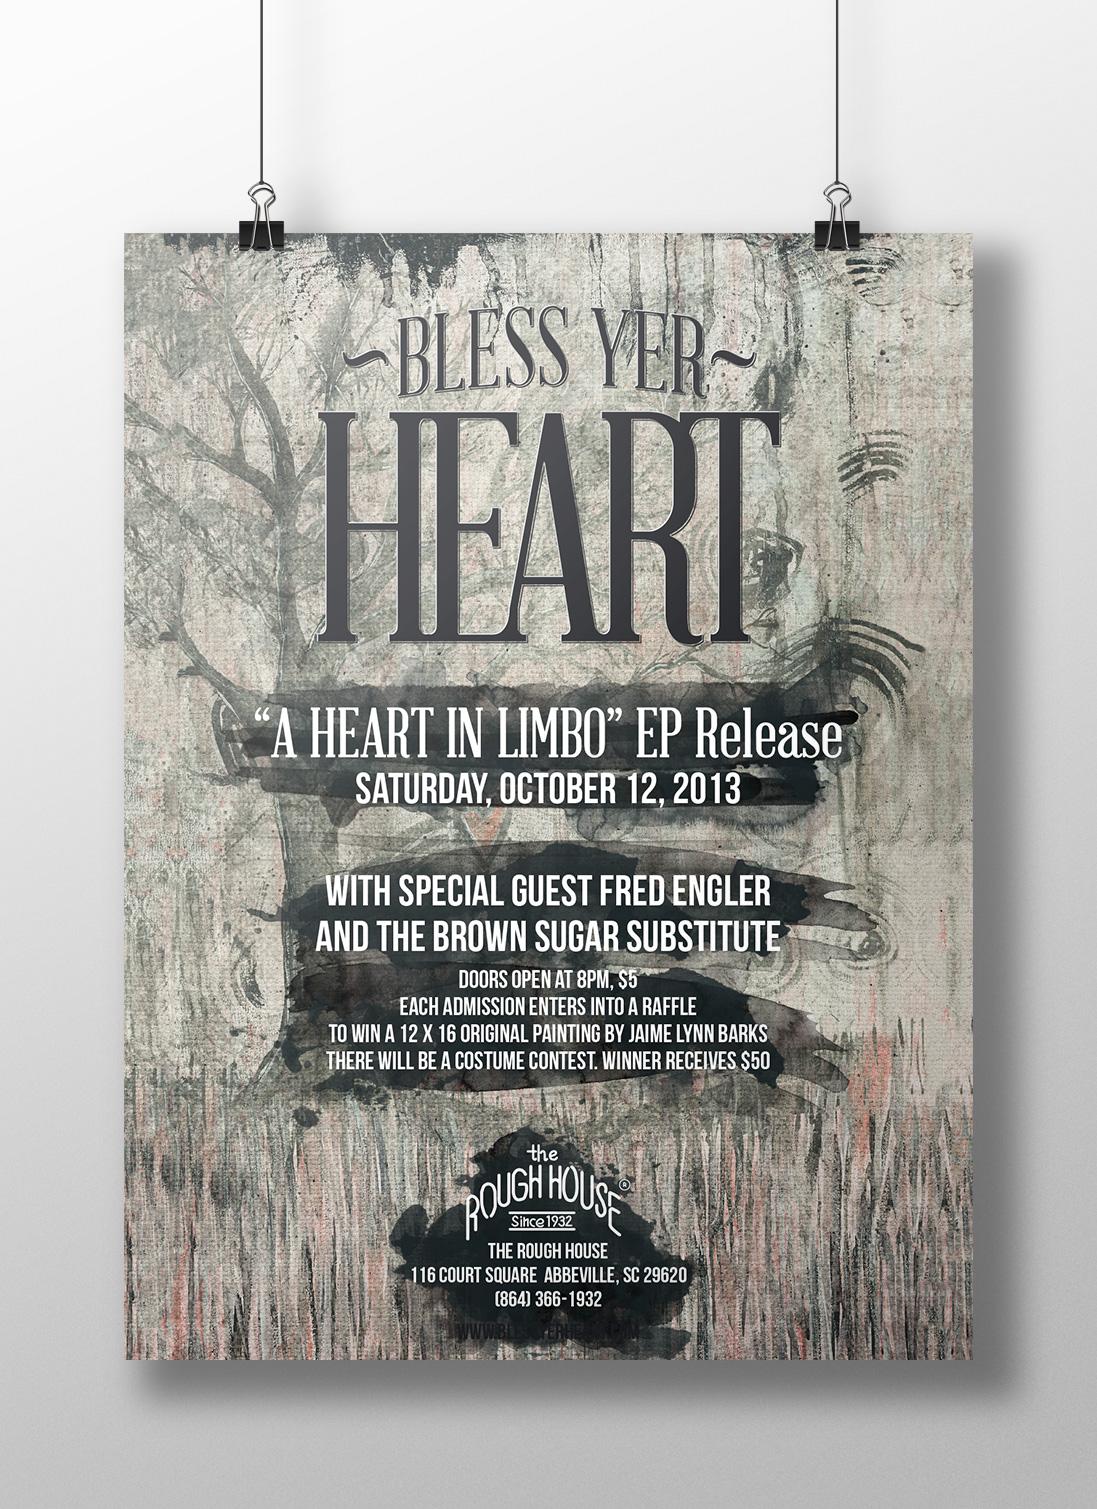 JekabsonsDotCom_BlessYerHeart_aHeartInLimbo_CD_RoughHouse_Poster